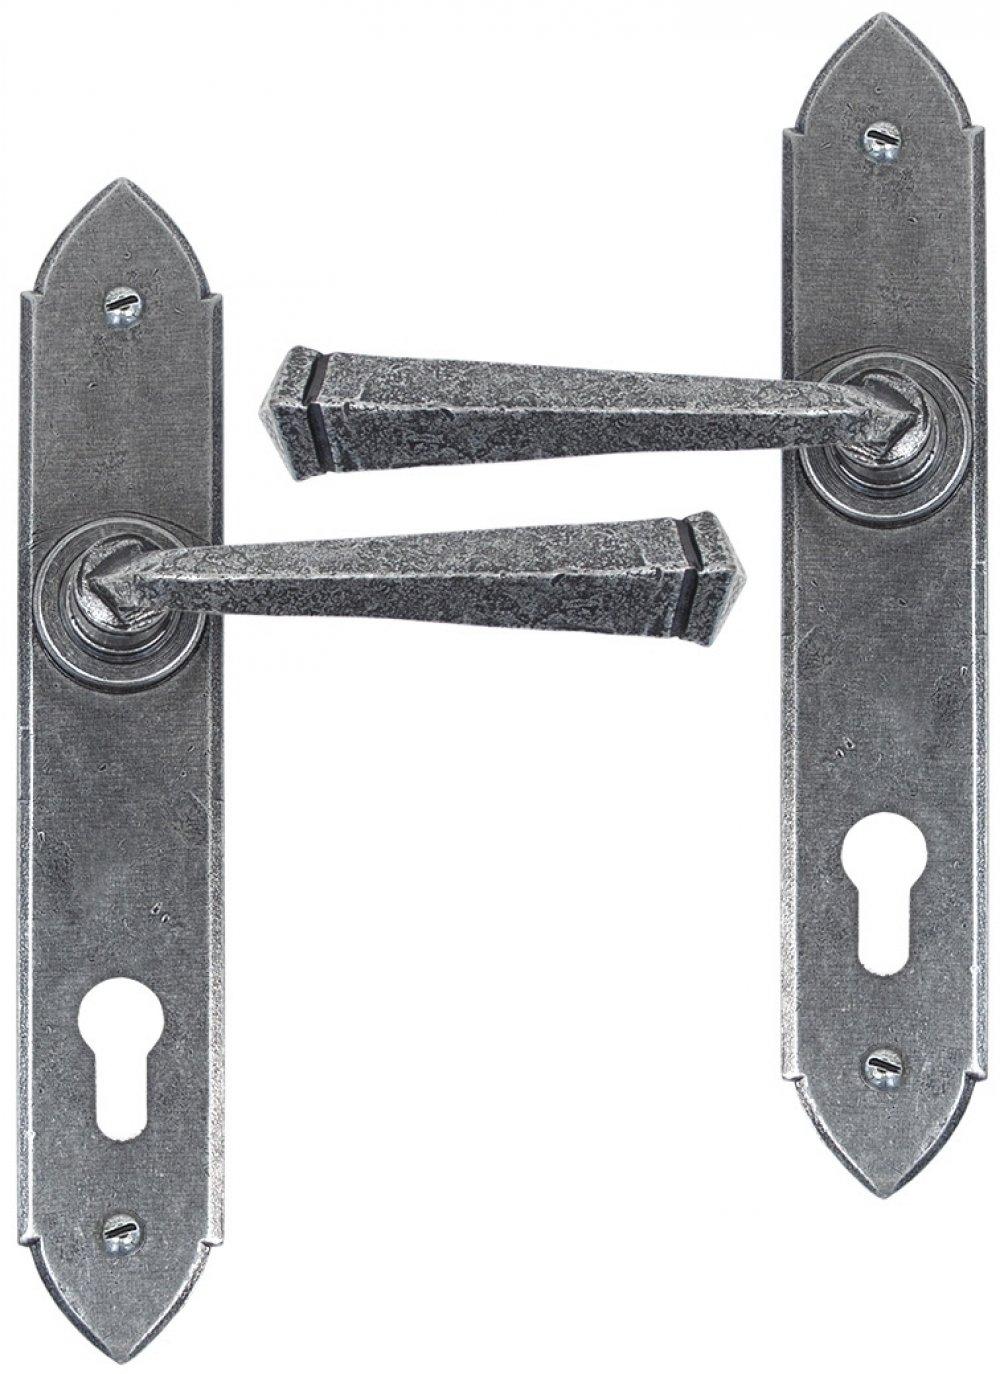 Pewter Gothic Lever Espag. Lock Set image